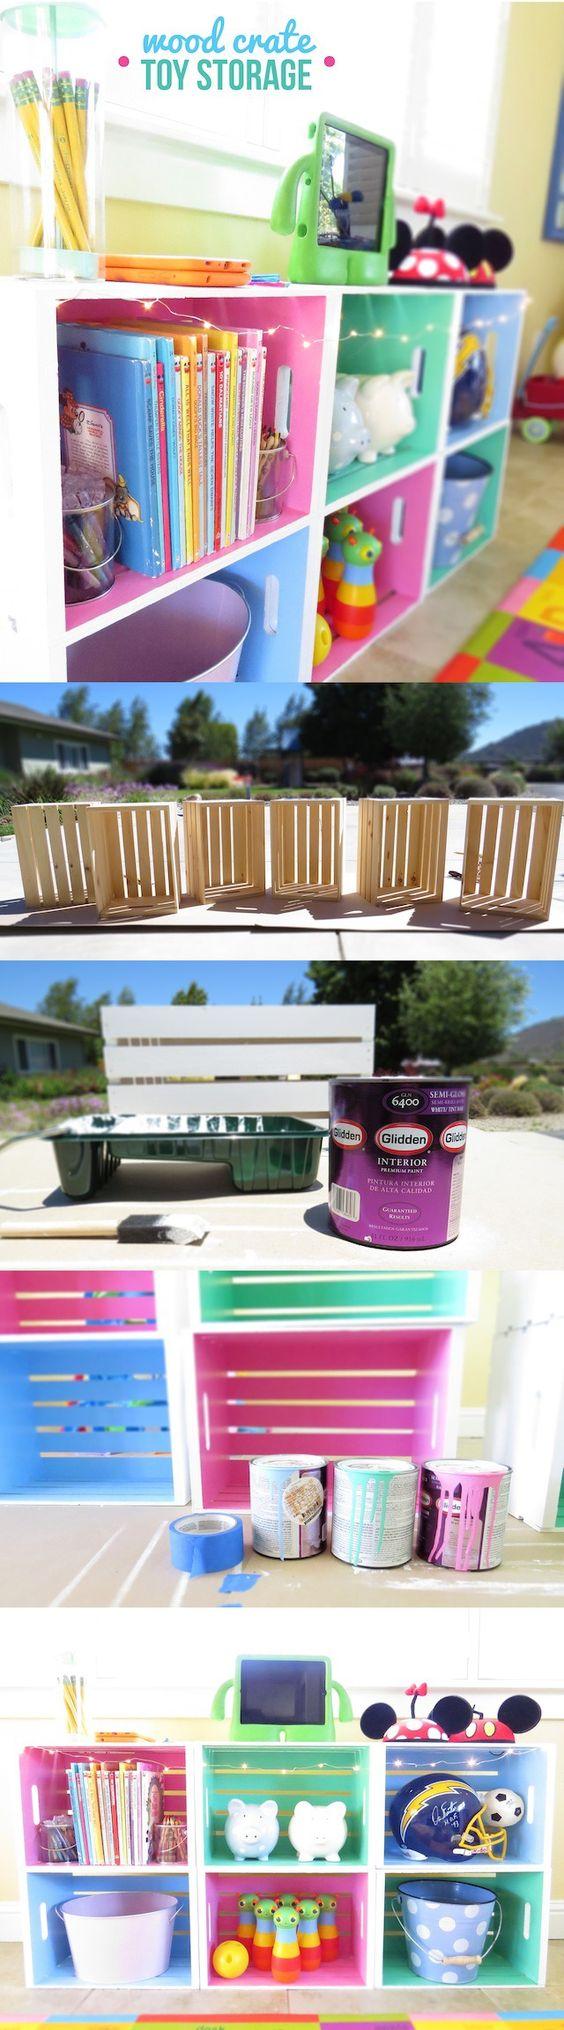 Ideas organizar juguetes 15 imagenes educativas for Ar 15 decorations